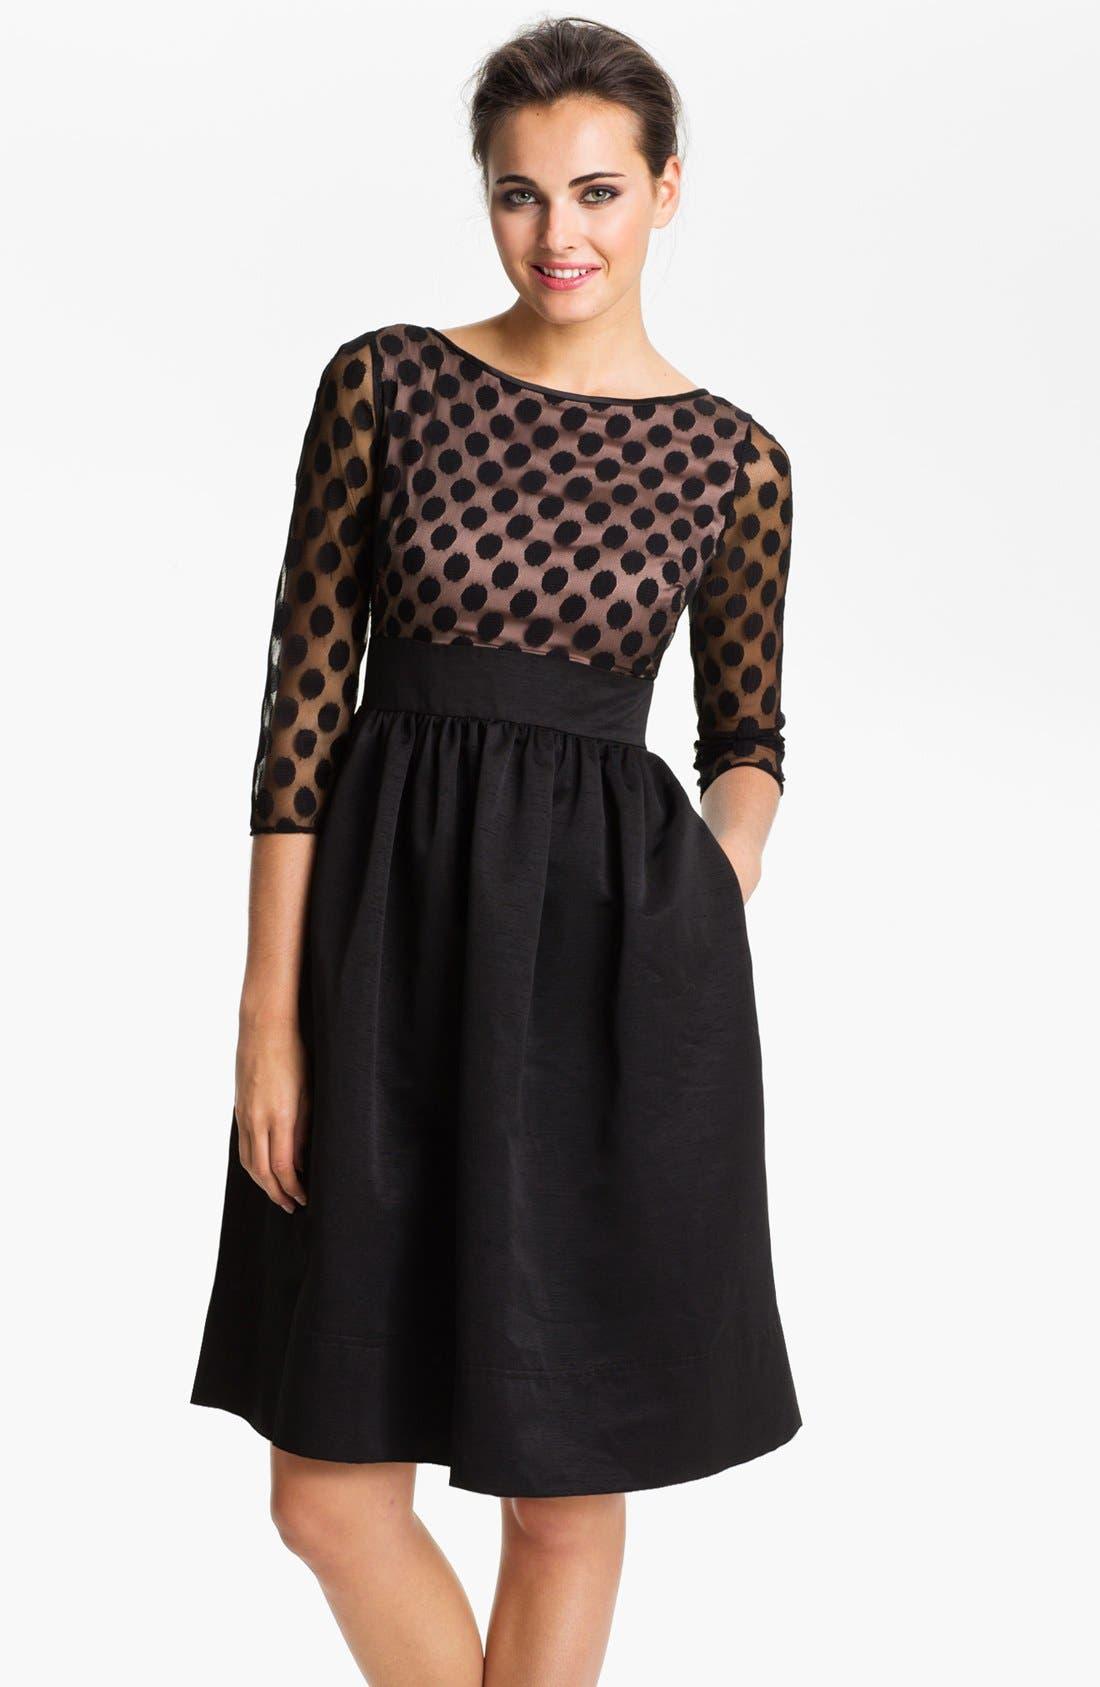 Petite Cocktail & Party Dresses | Nordstrom